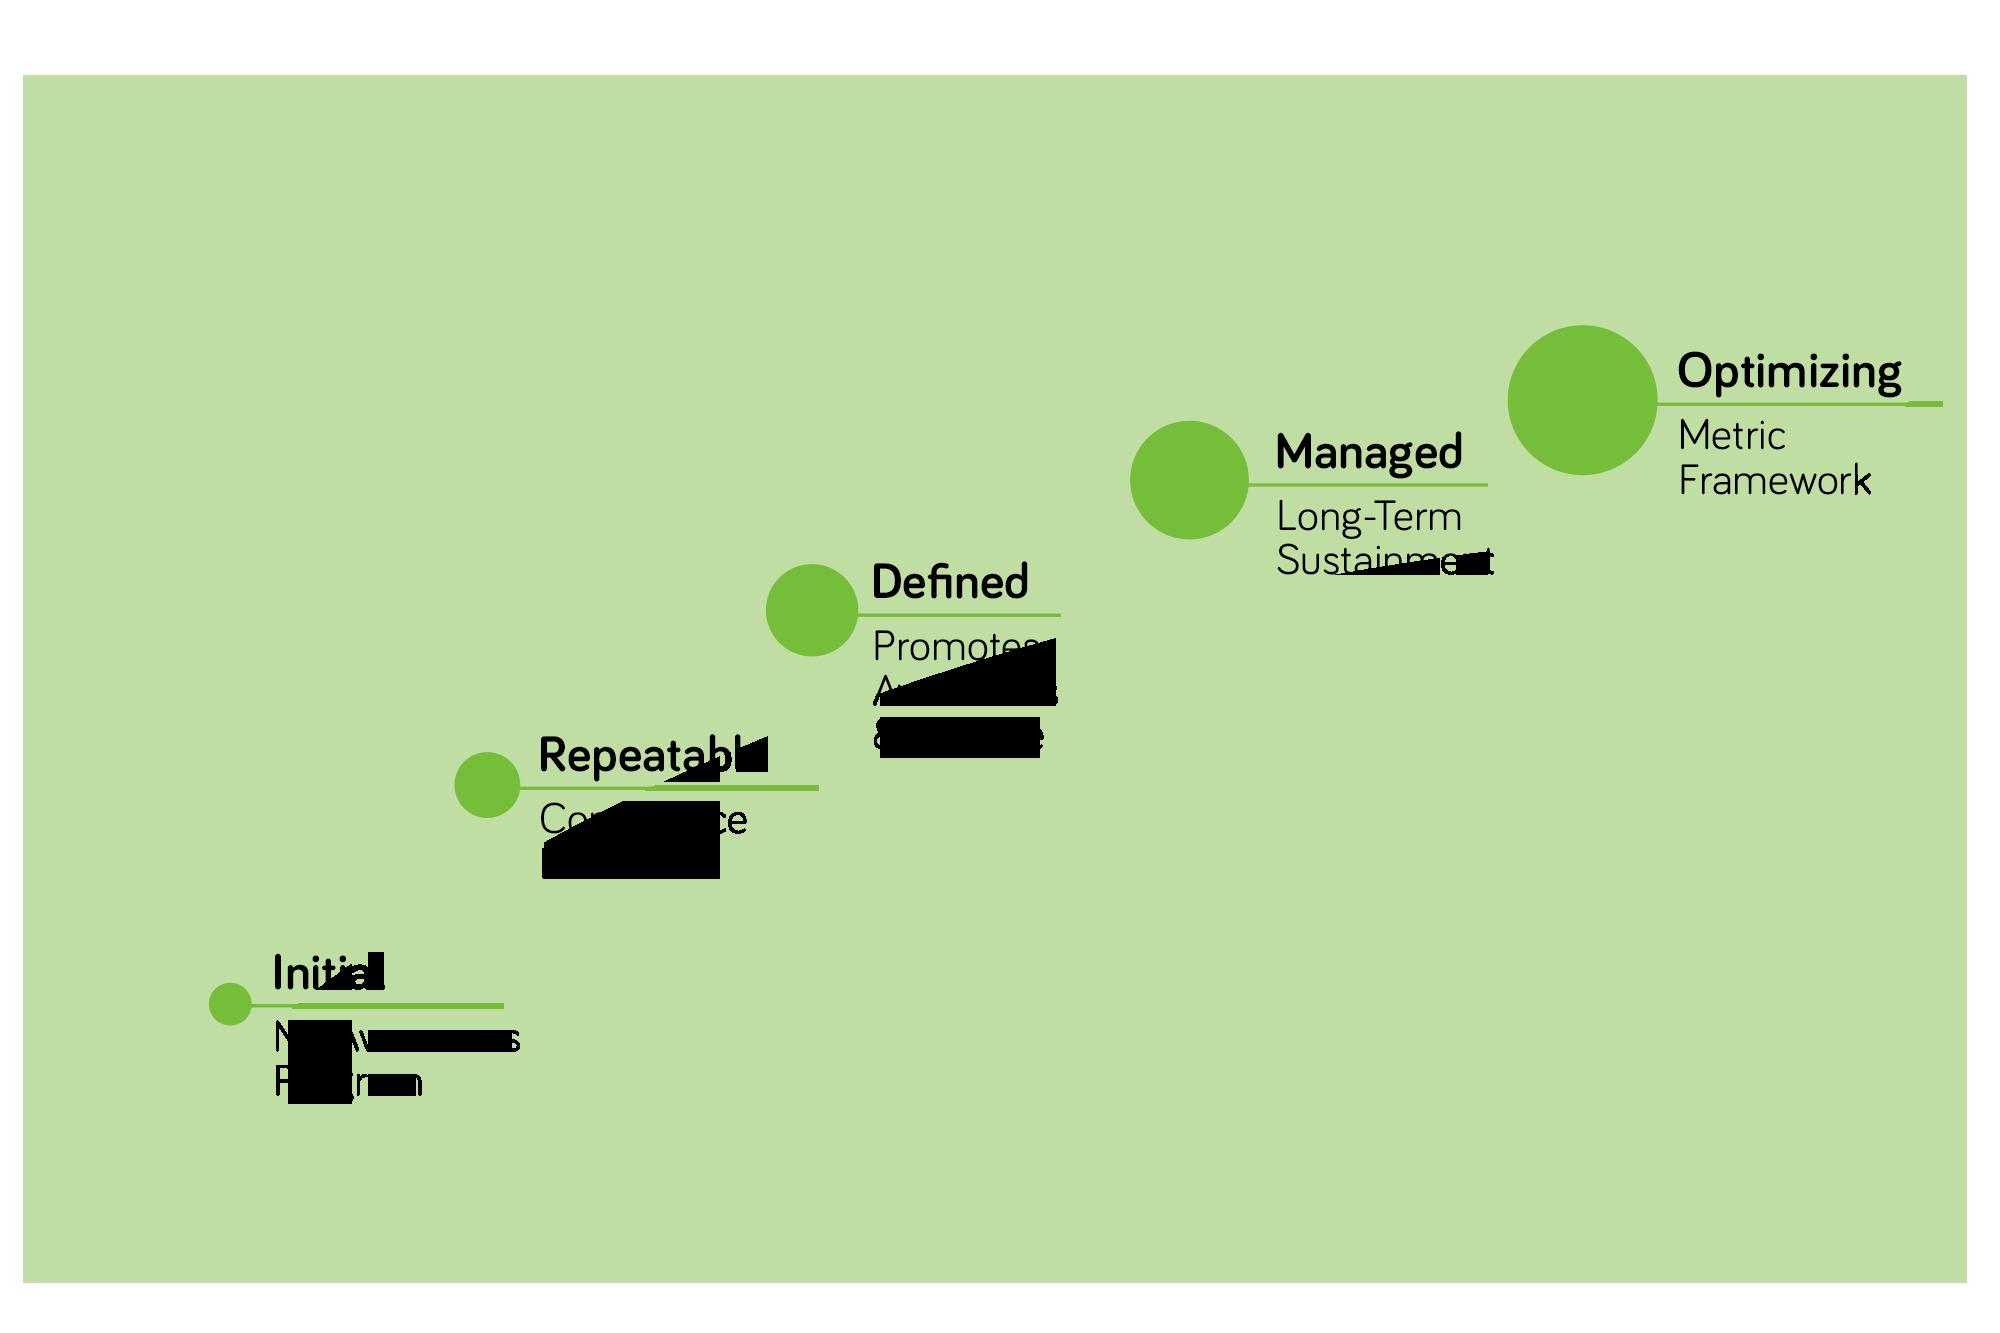 Capability maturity model (CMM) of security culture